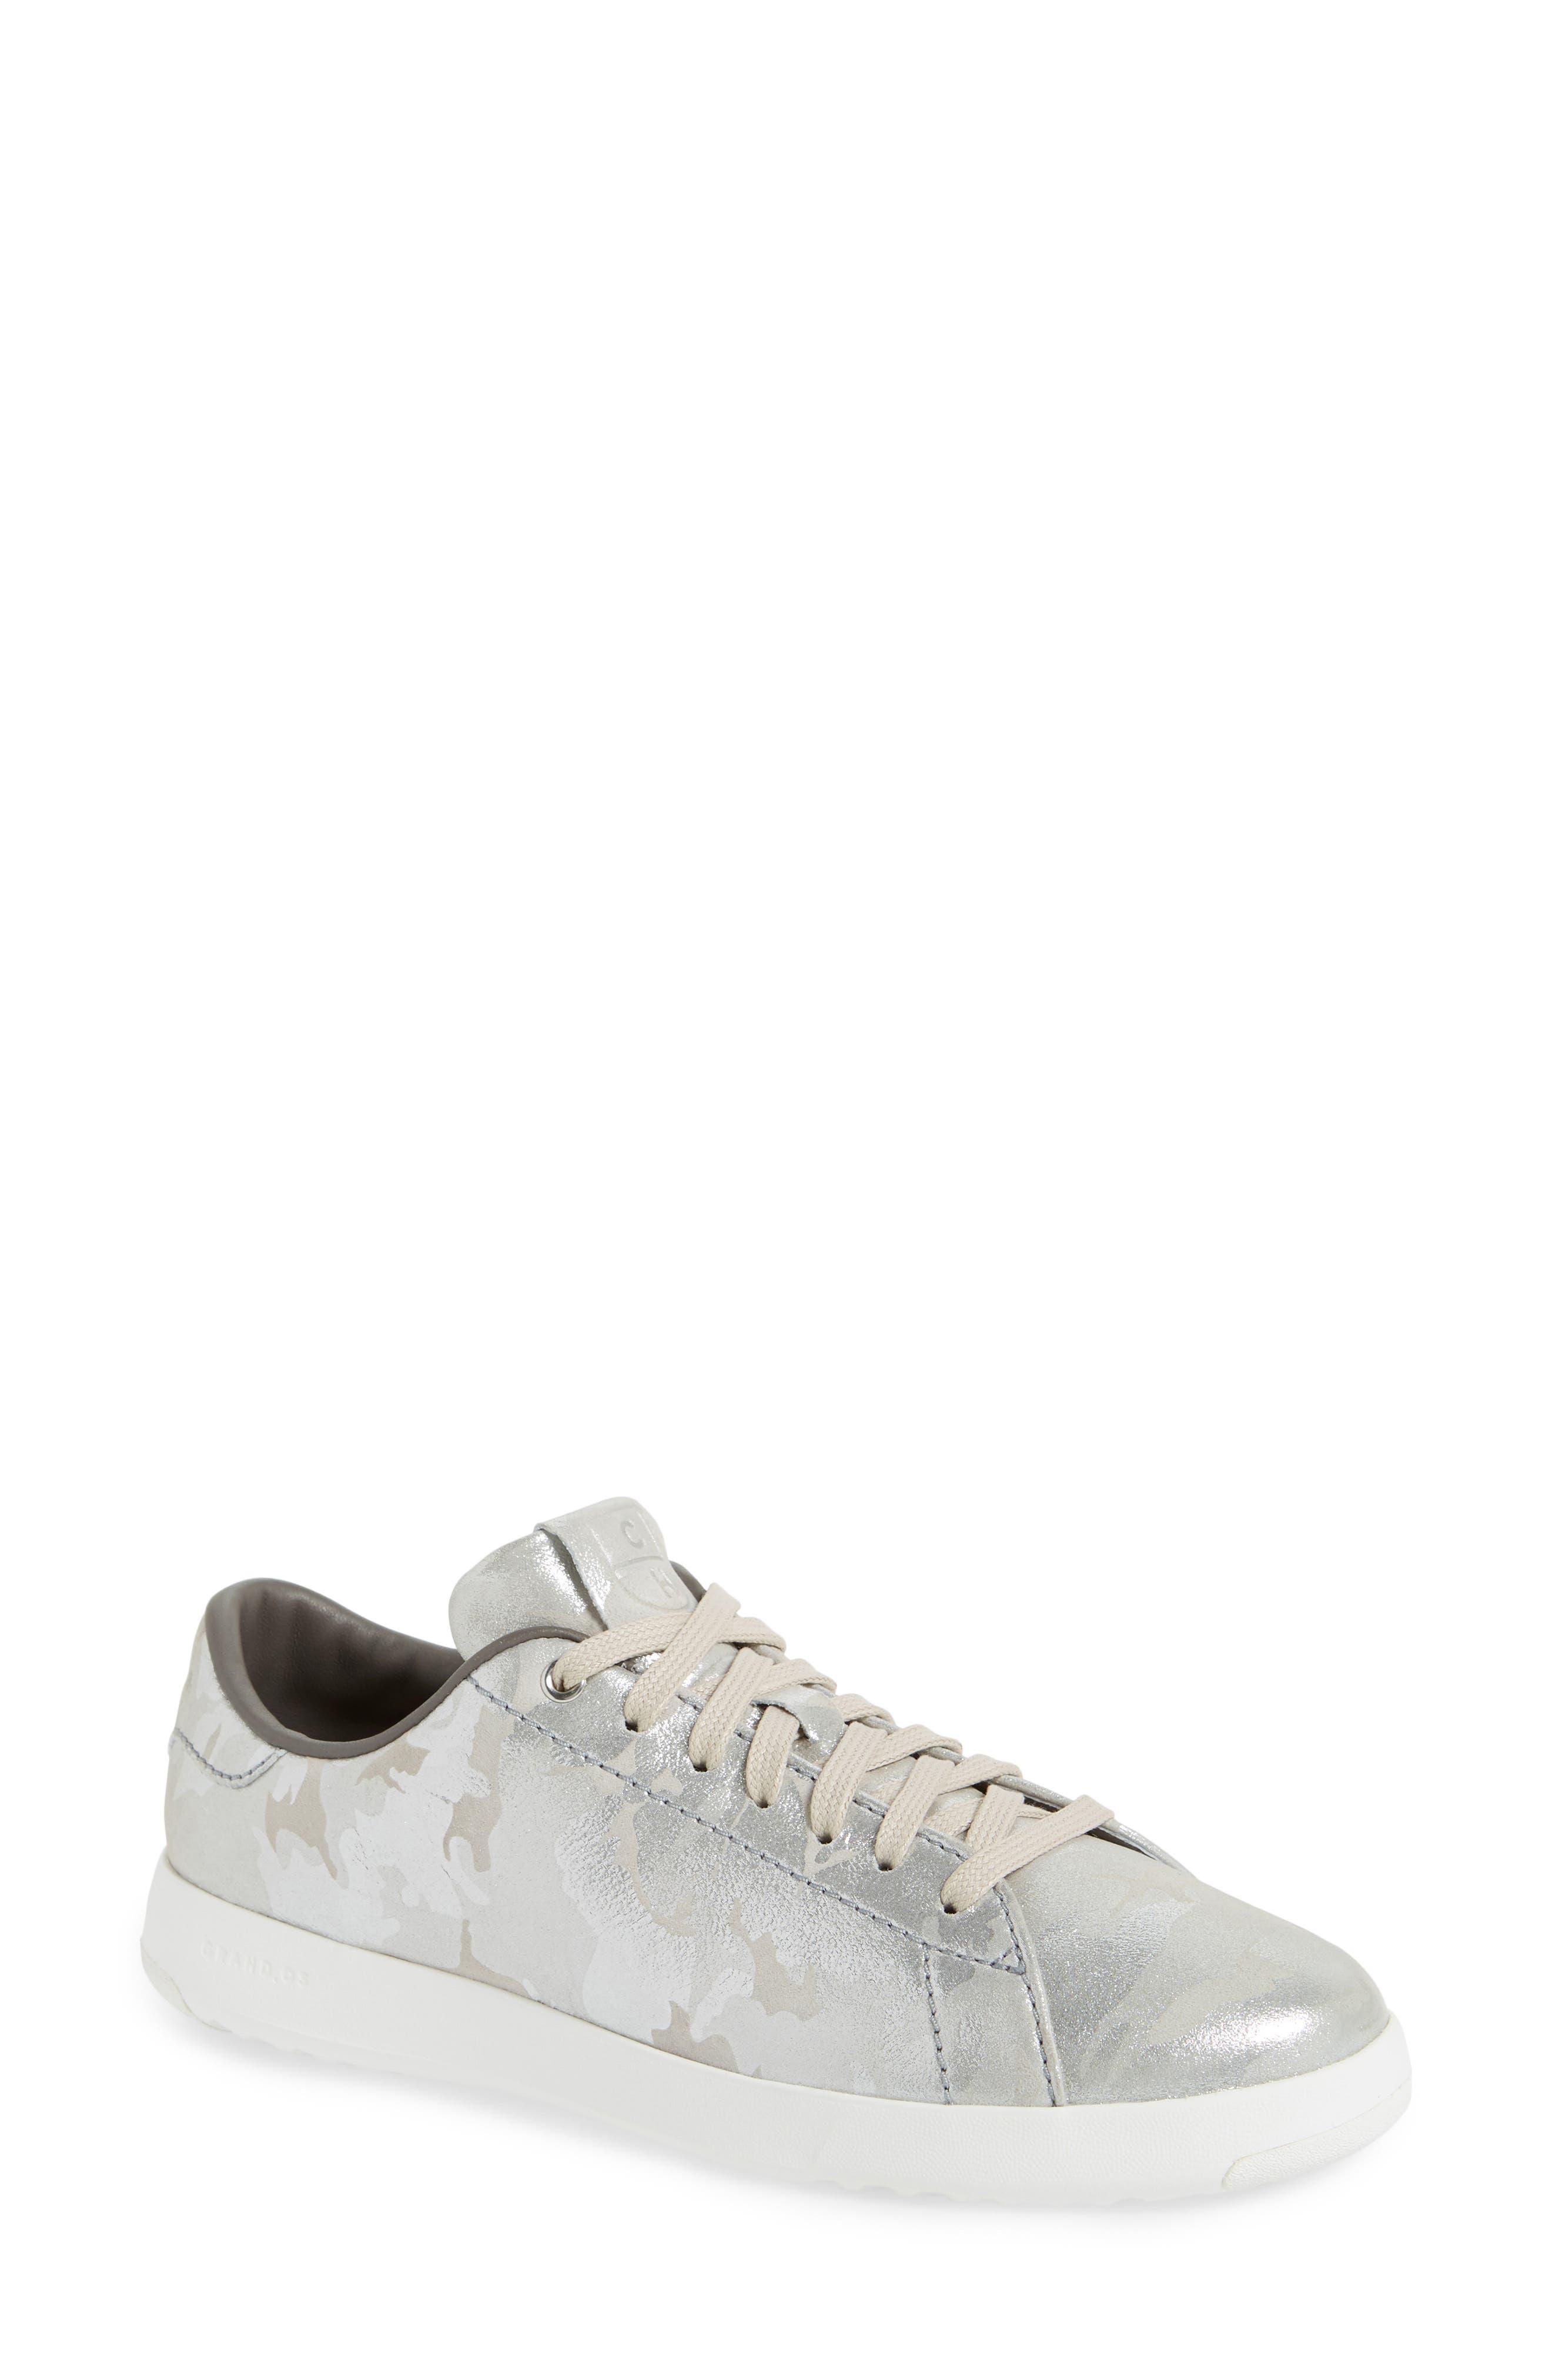 GrandPro Tennis Shoe,                         Main,                         color, 024